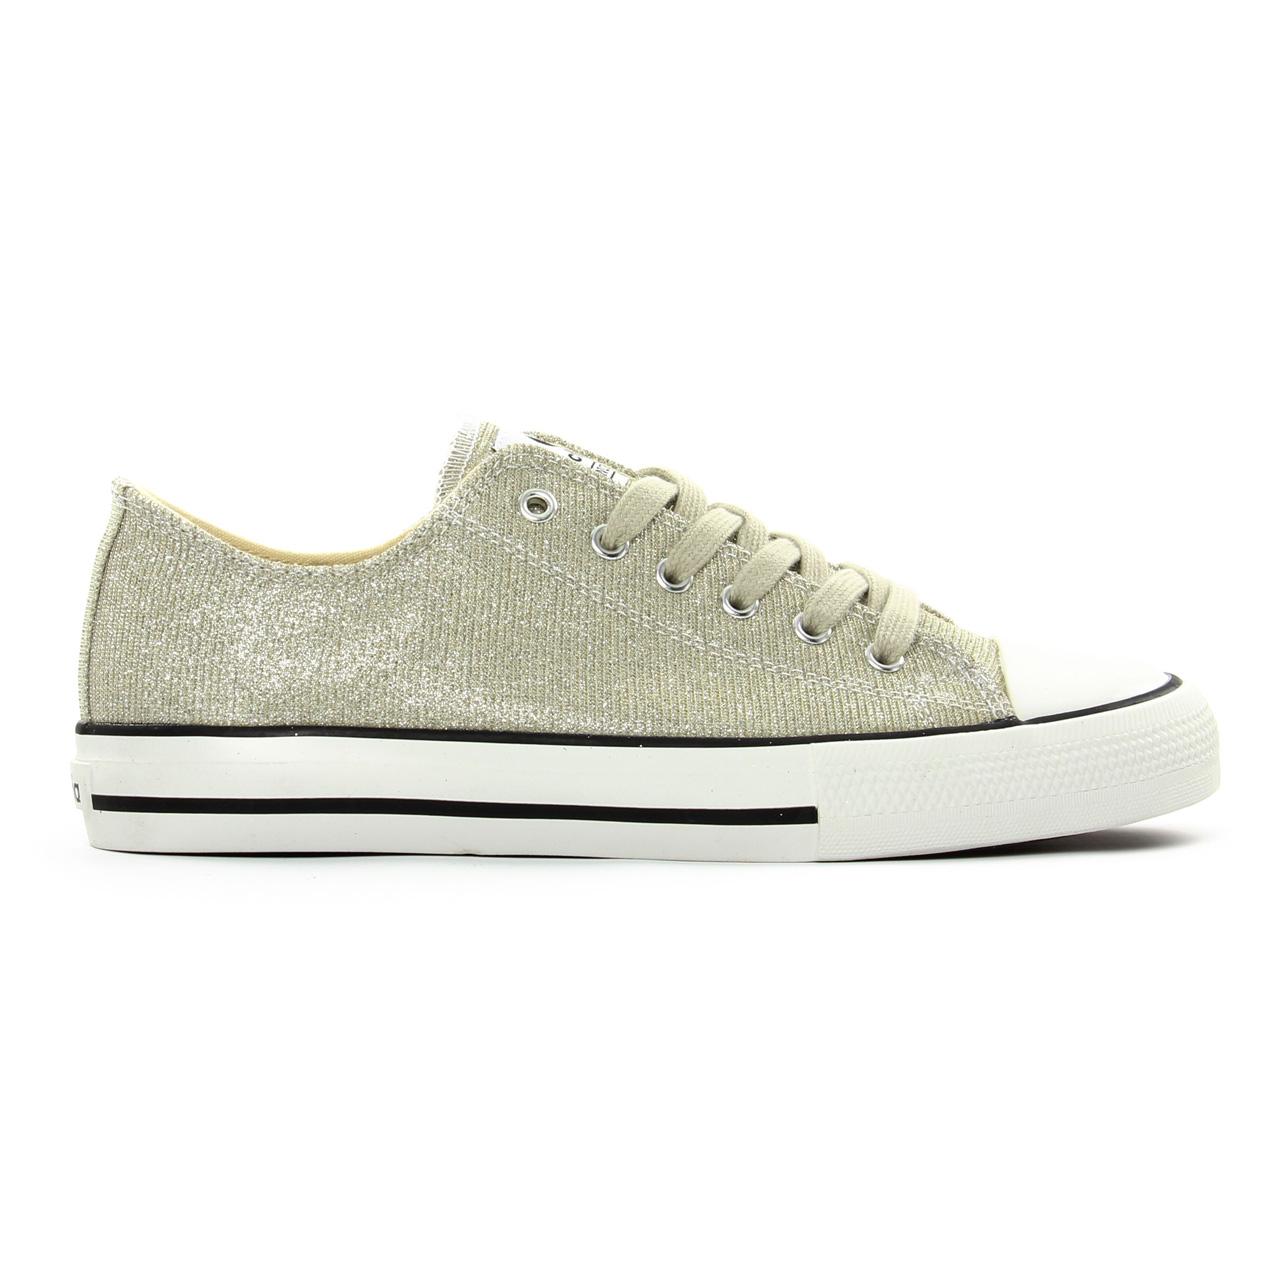 Toile Chaussures Y8rxyq En 1065108 Or Victoria URzYw